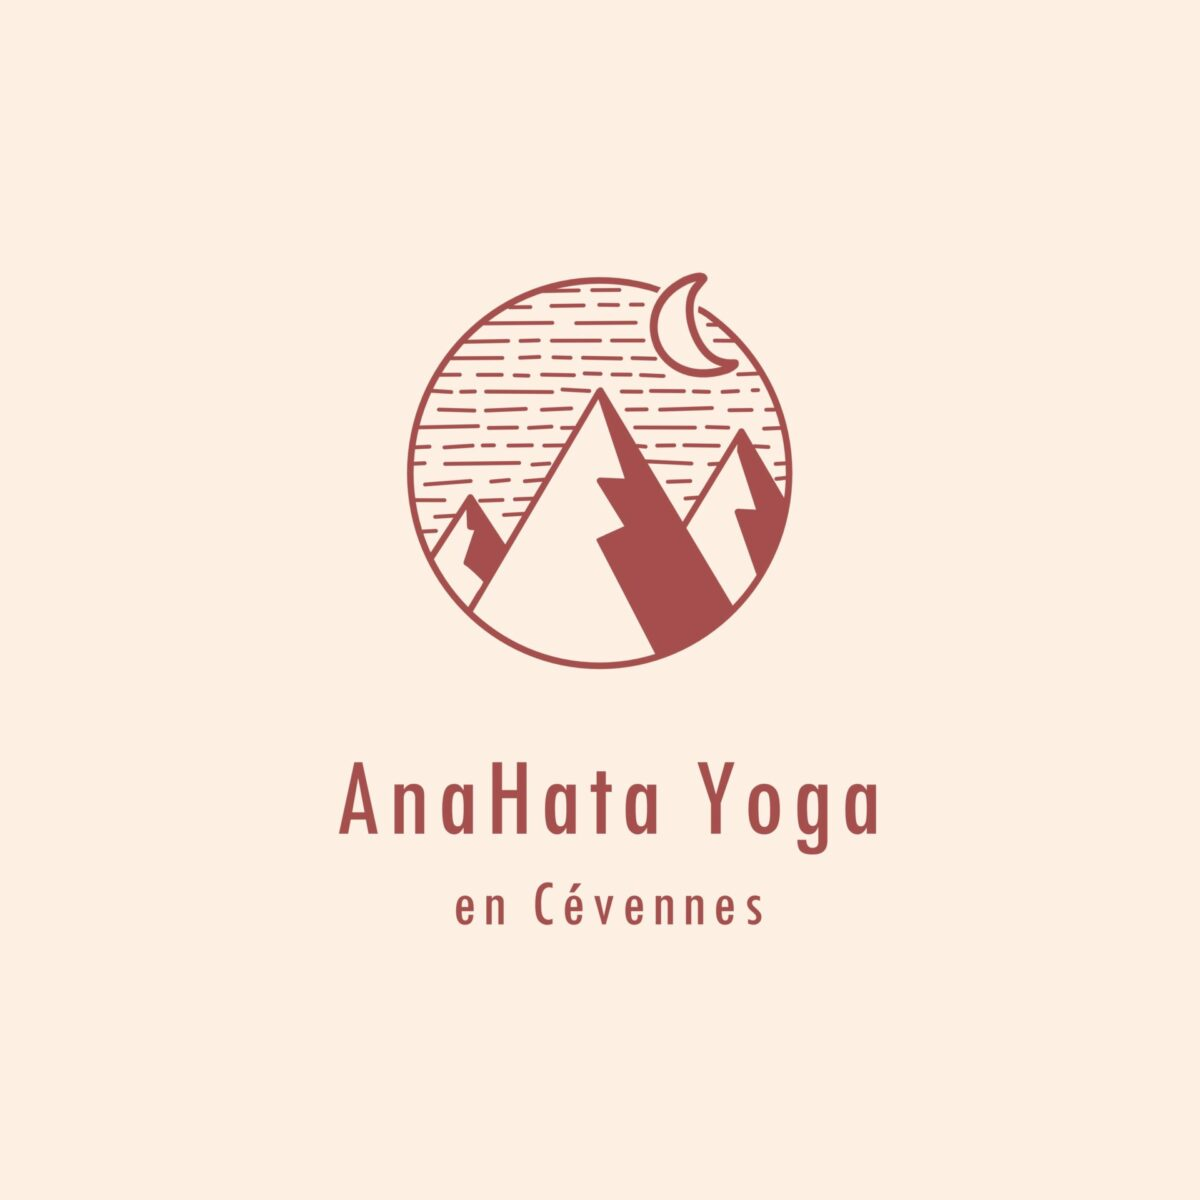 visuel AnaHata Yoga